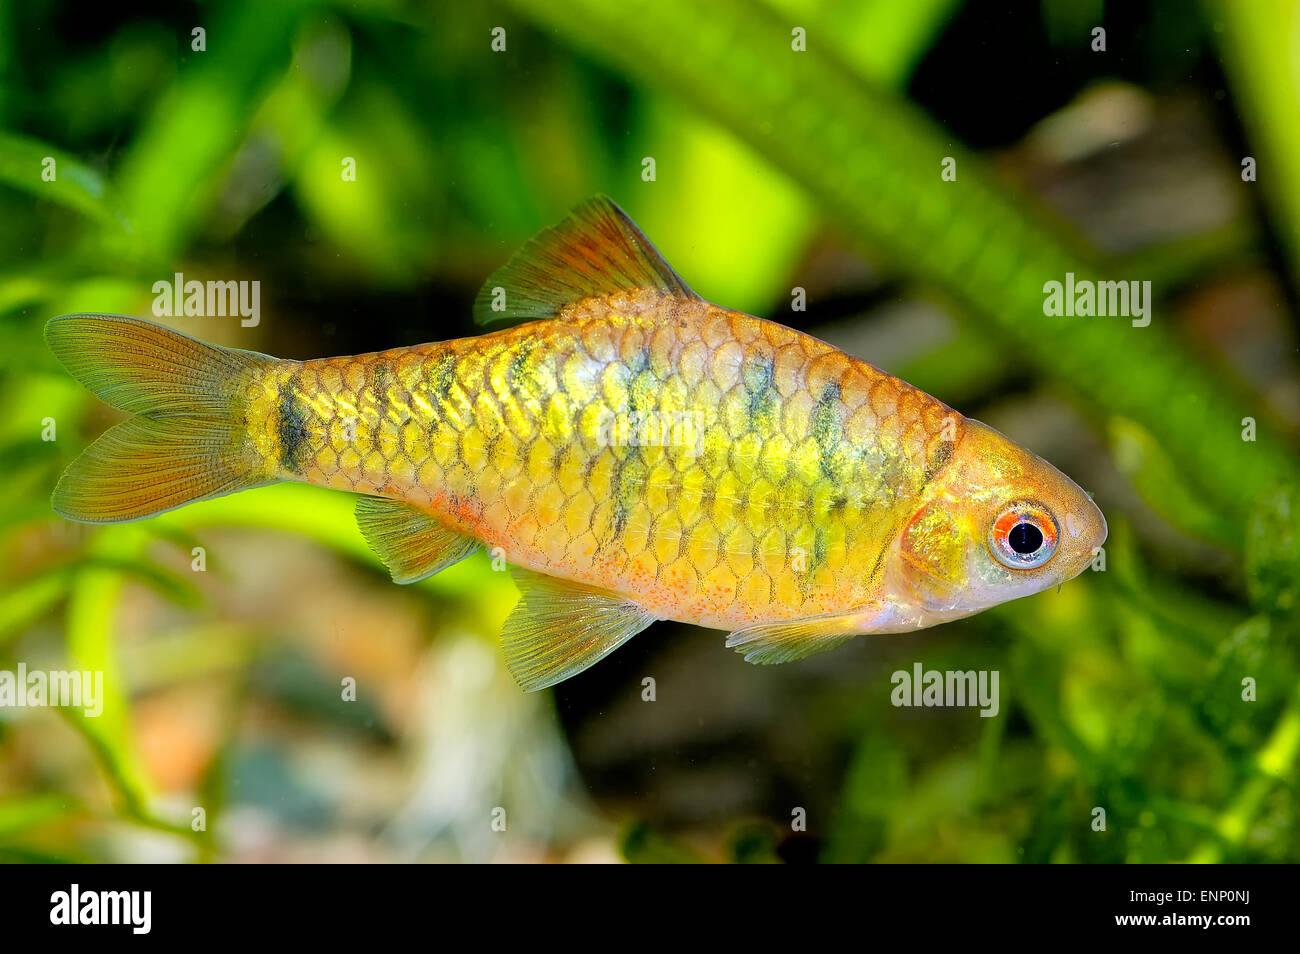 Tropical Freshwater Aquarium Fish From Stock Photos & Tropical ...